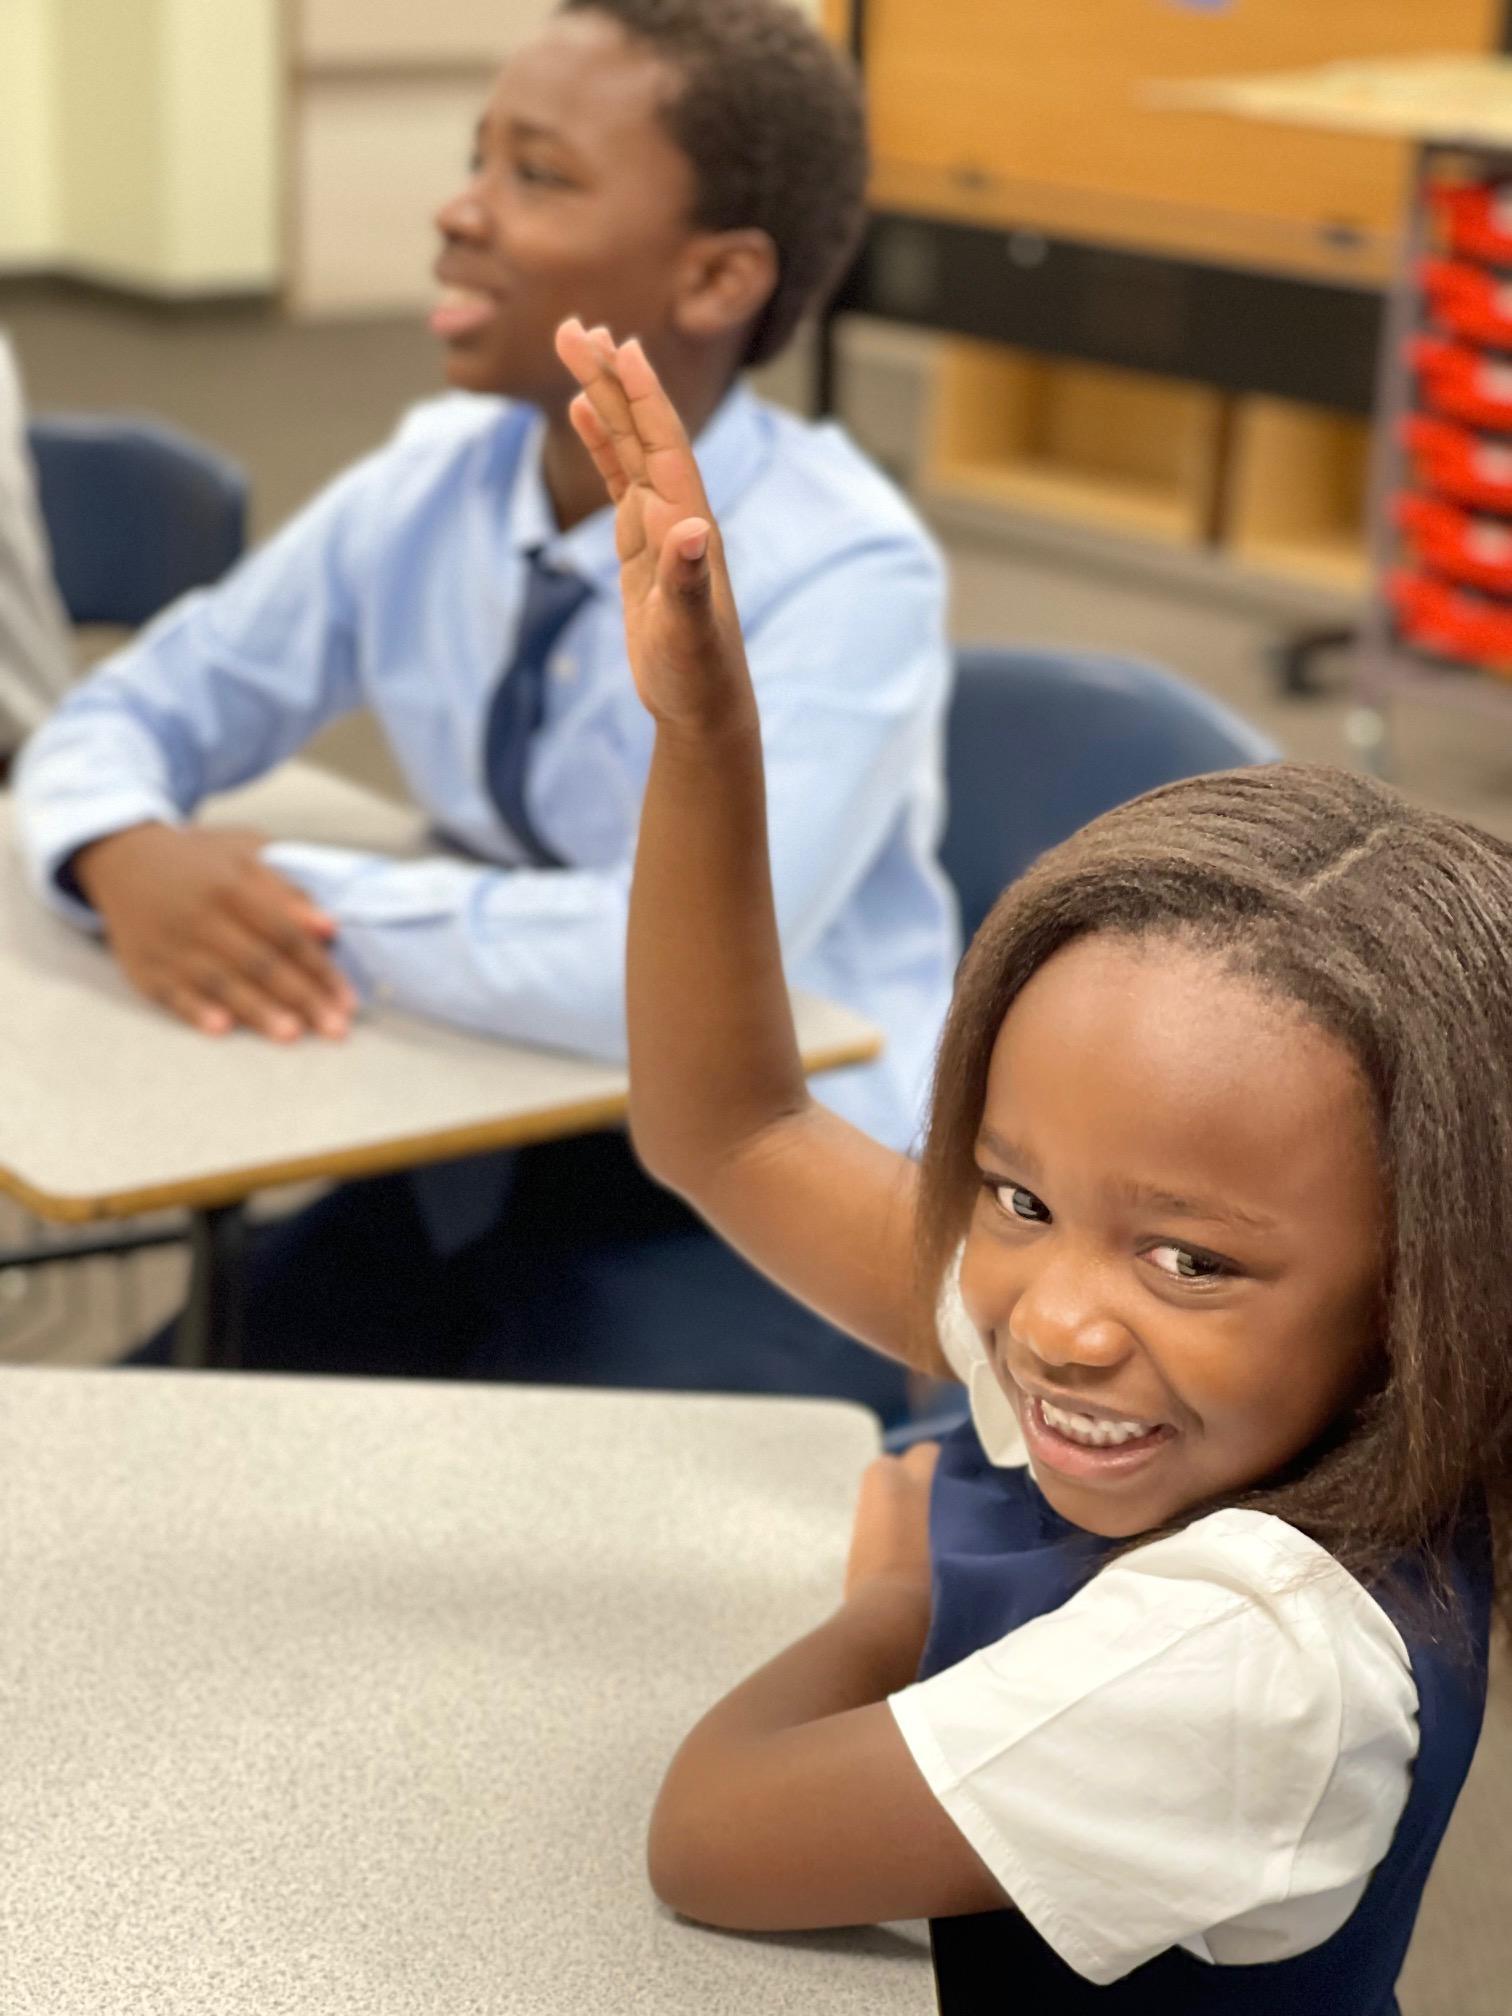 two children in class, legacy preparatory academy best charter school near me